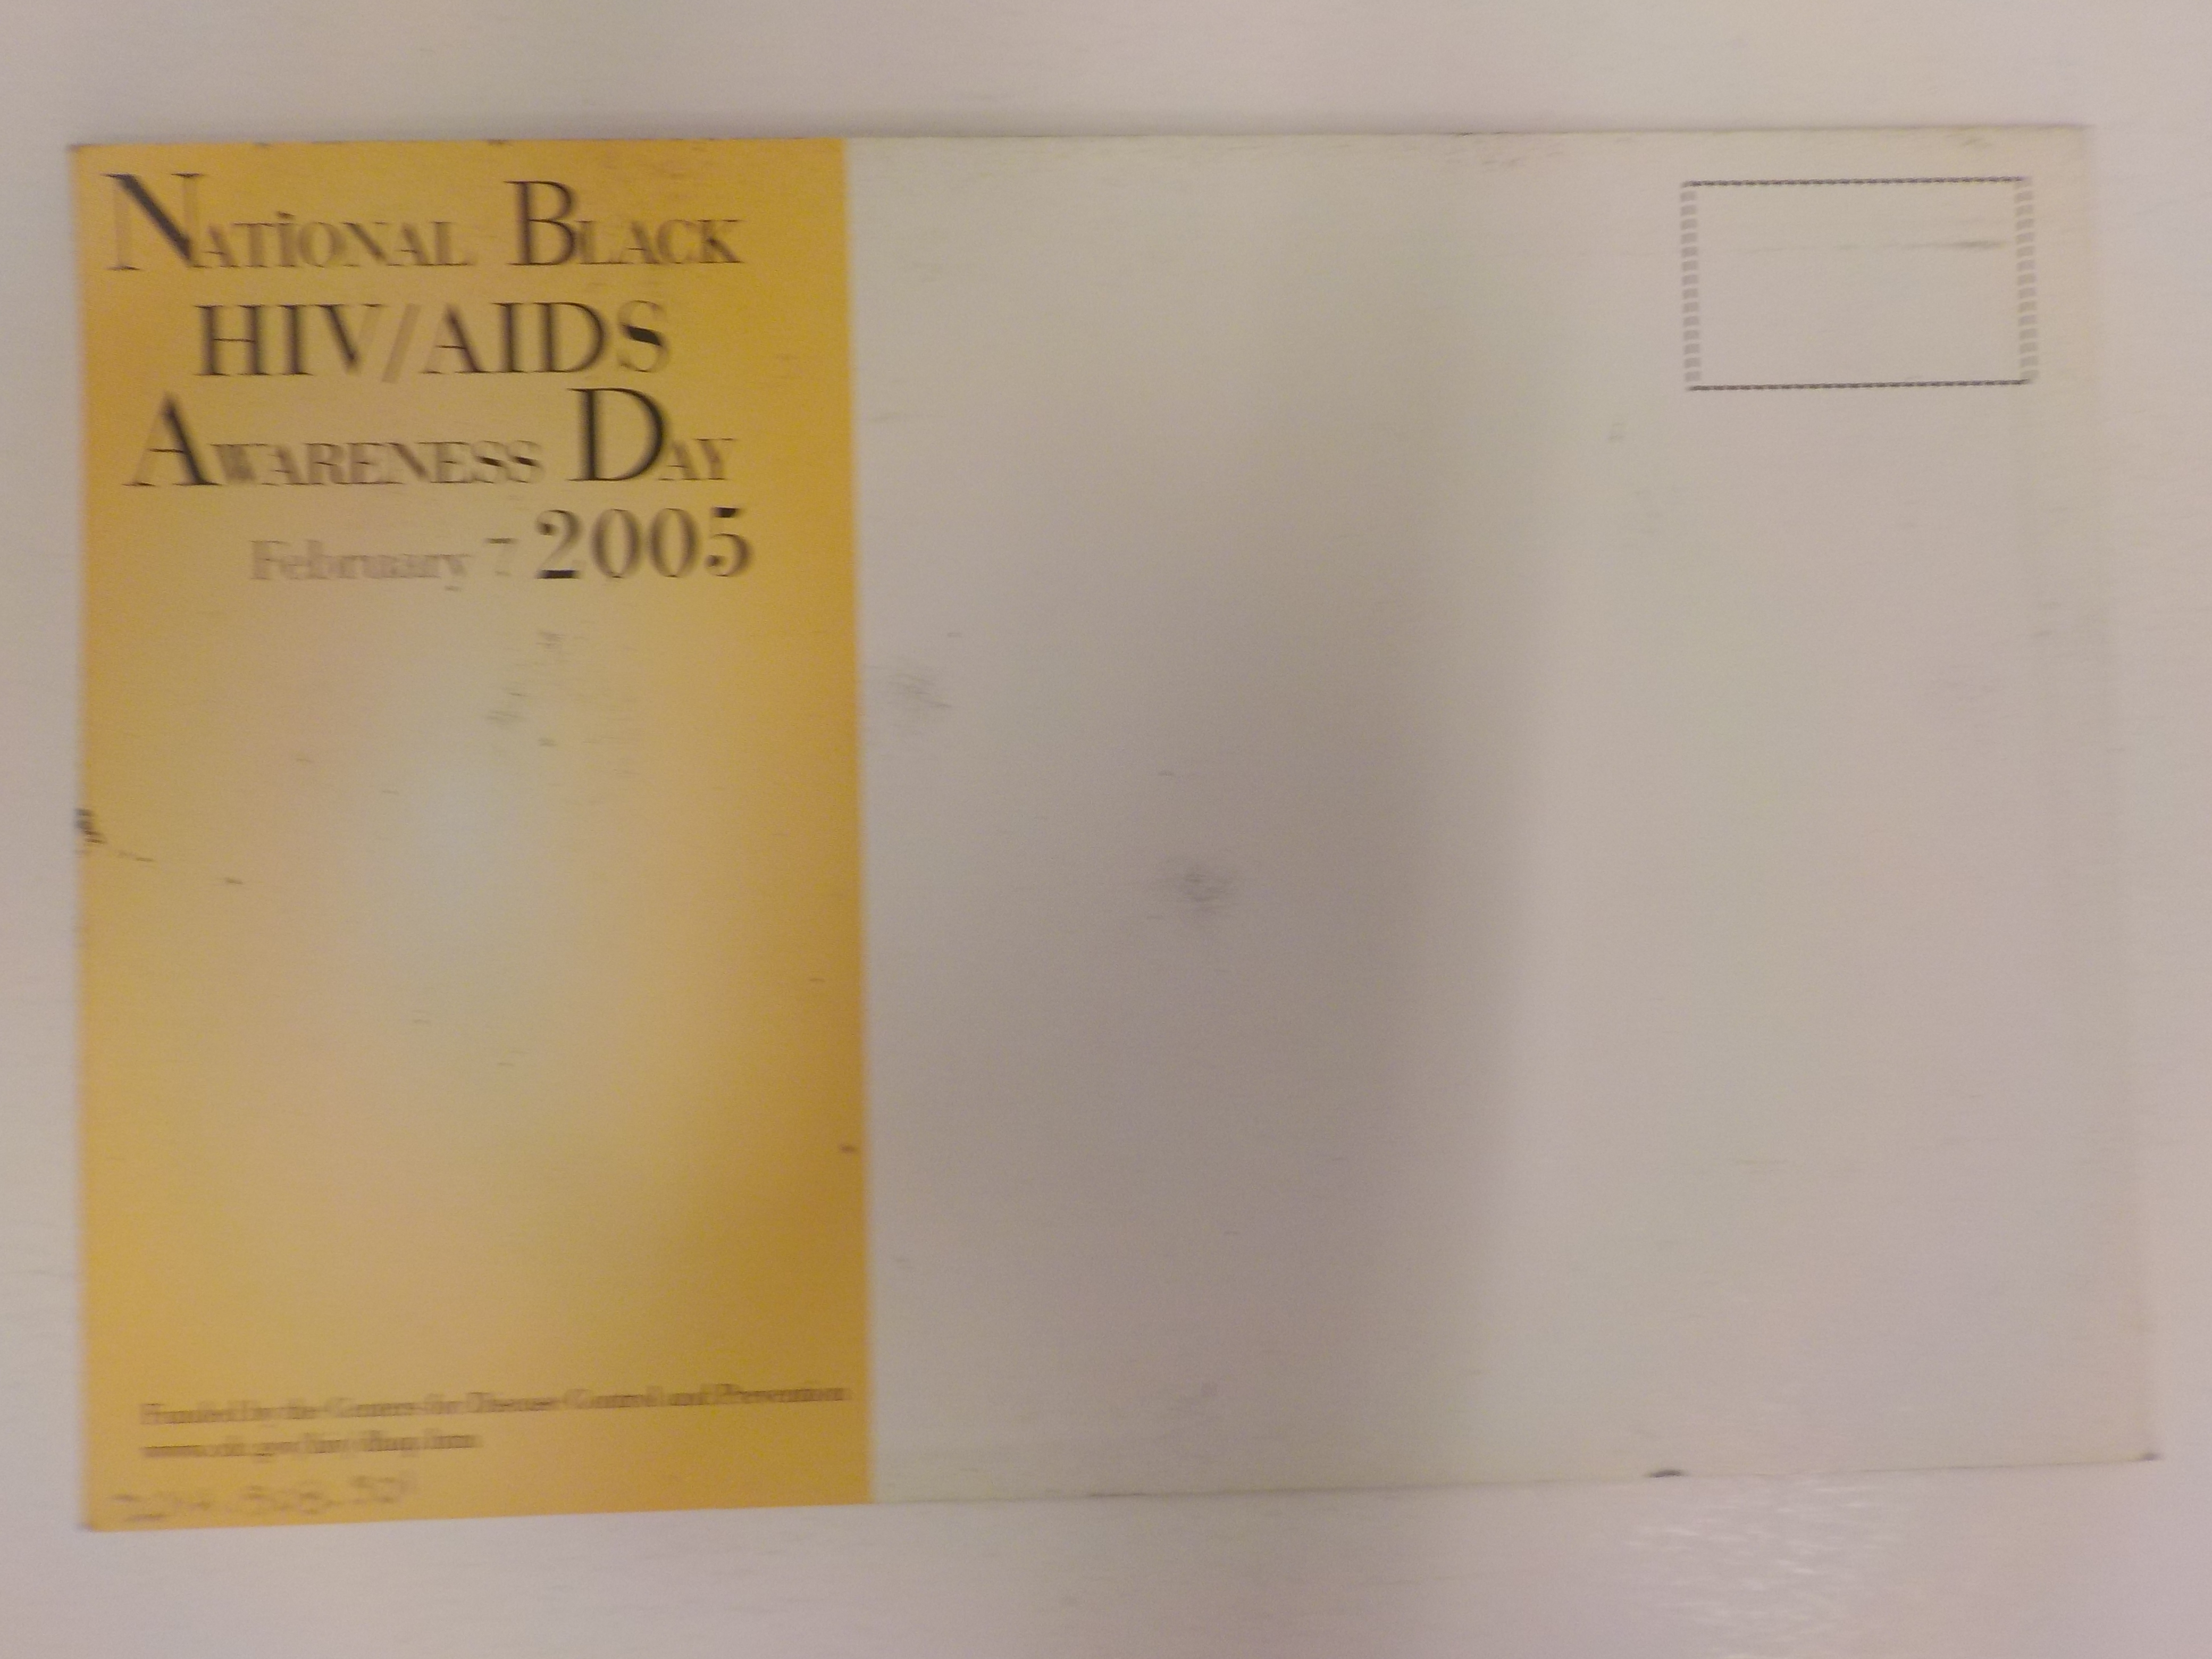 National Black HIV/AIDS Awareness Day 2005 postcard [back]